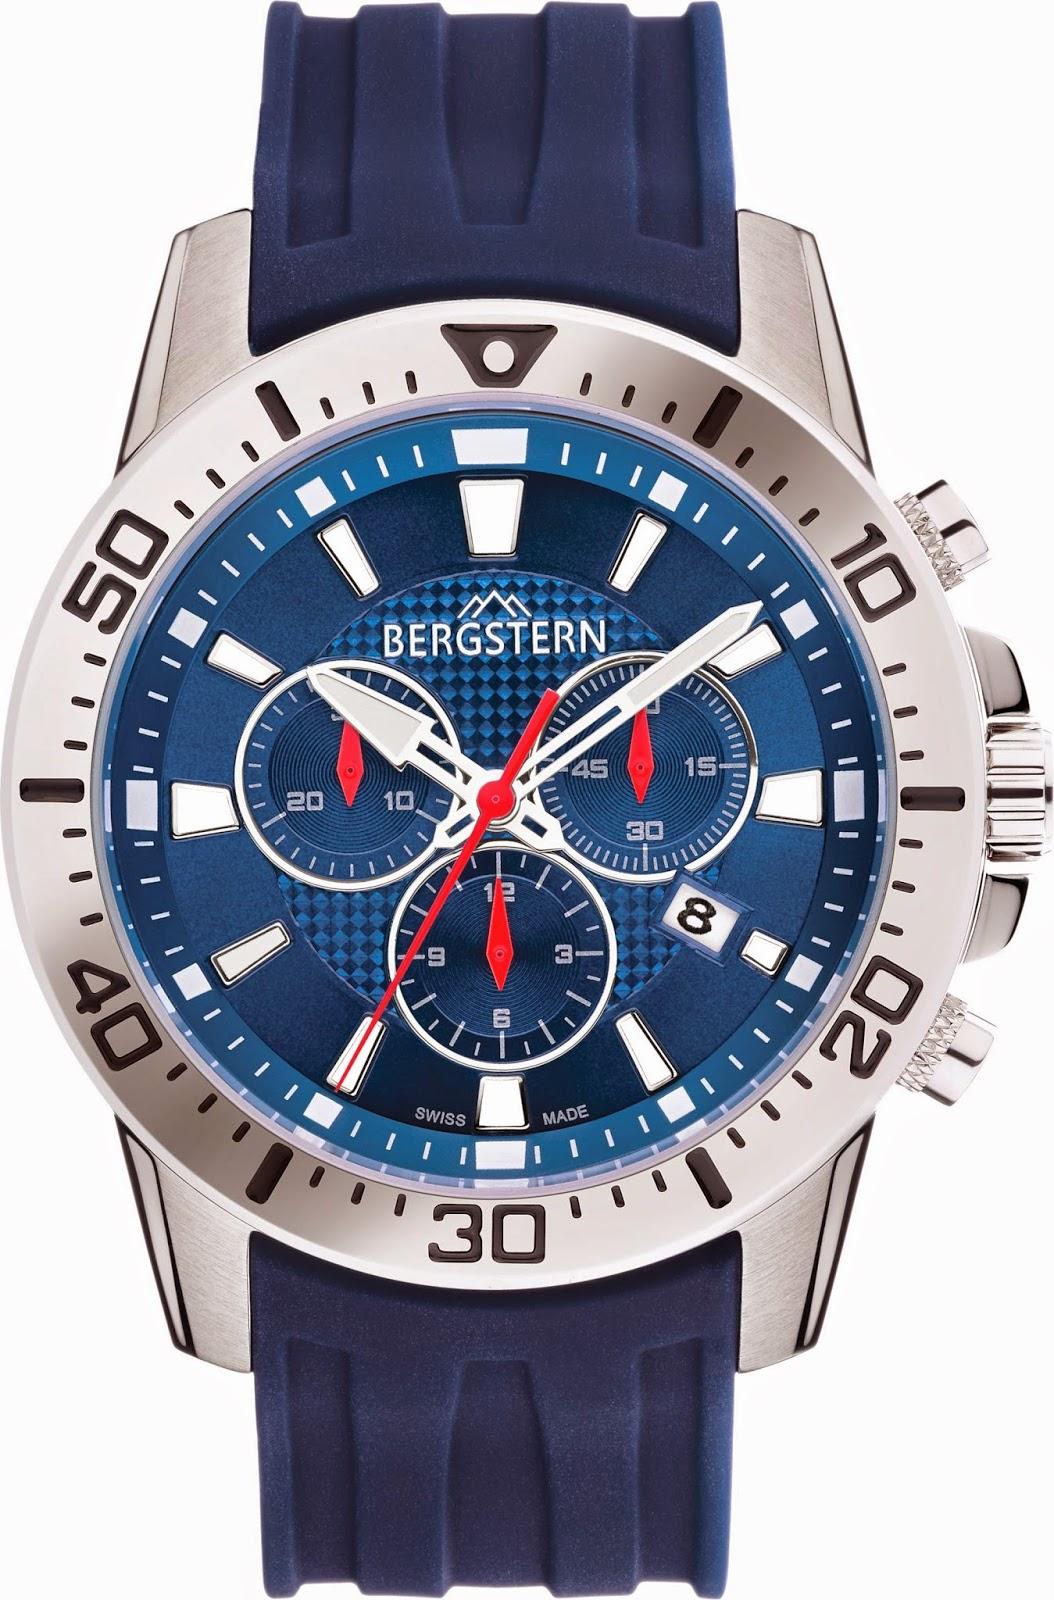 Bergstern Active Sports Watch